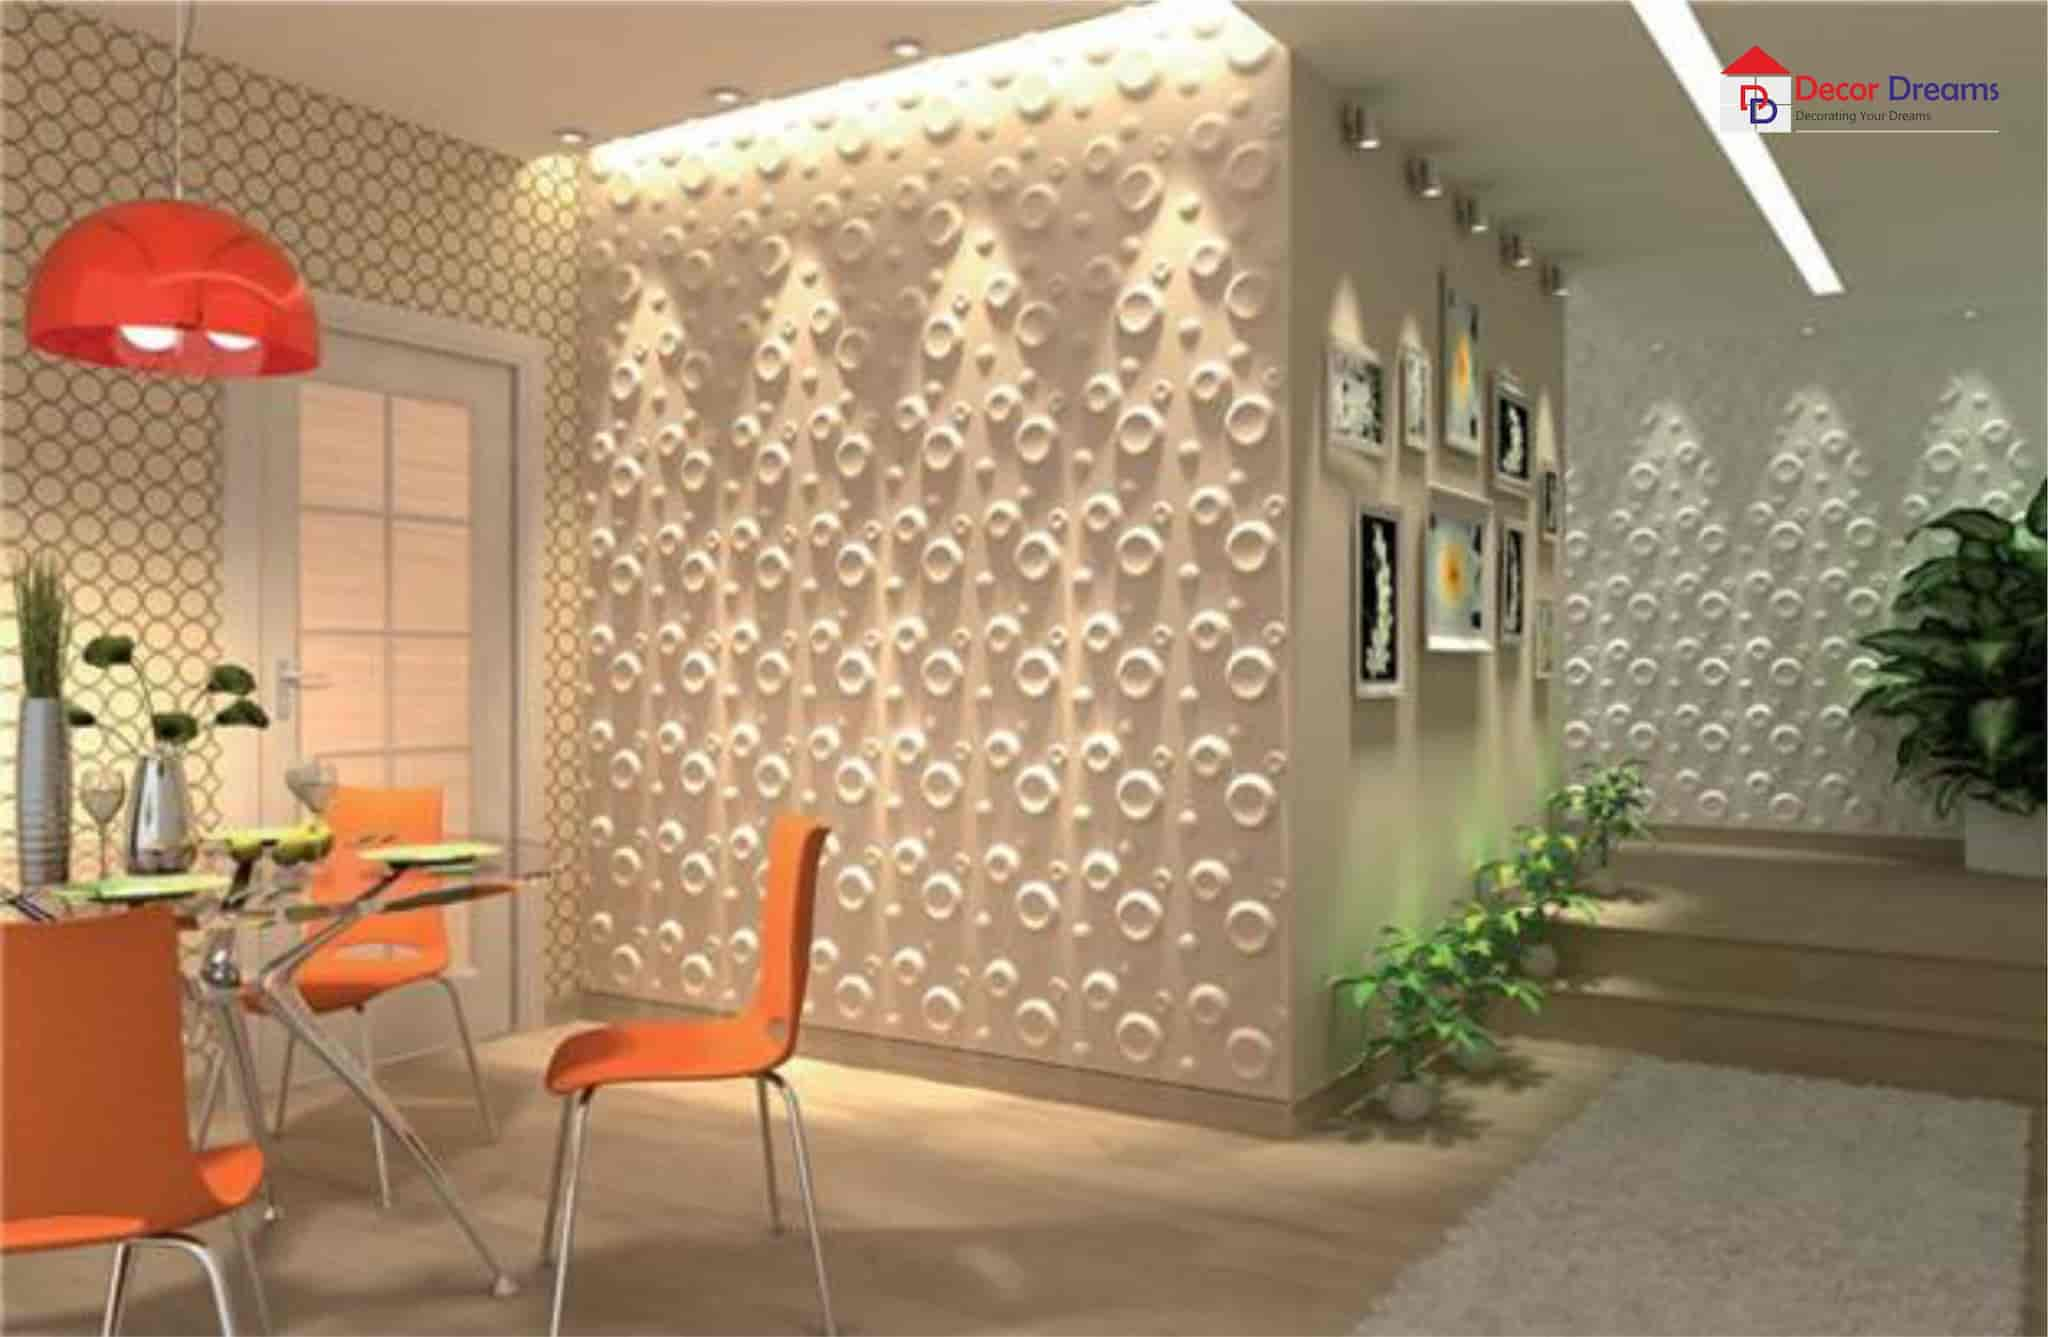 Decor Dreams Ramgarh Cantt Decor Dreamz Pvc Wall Panel